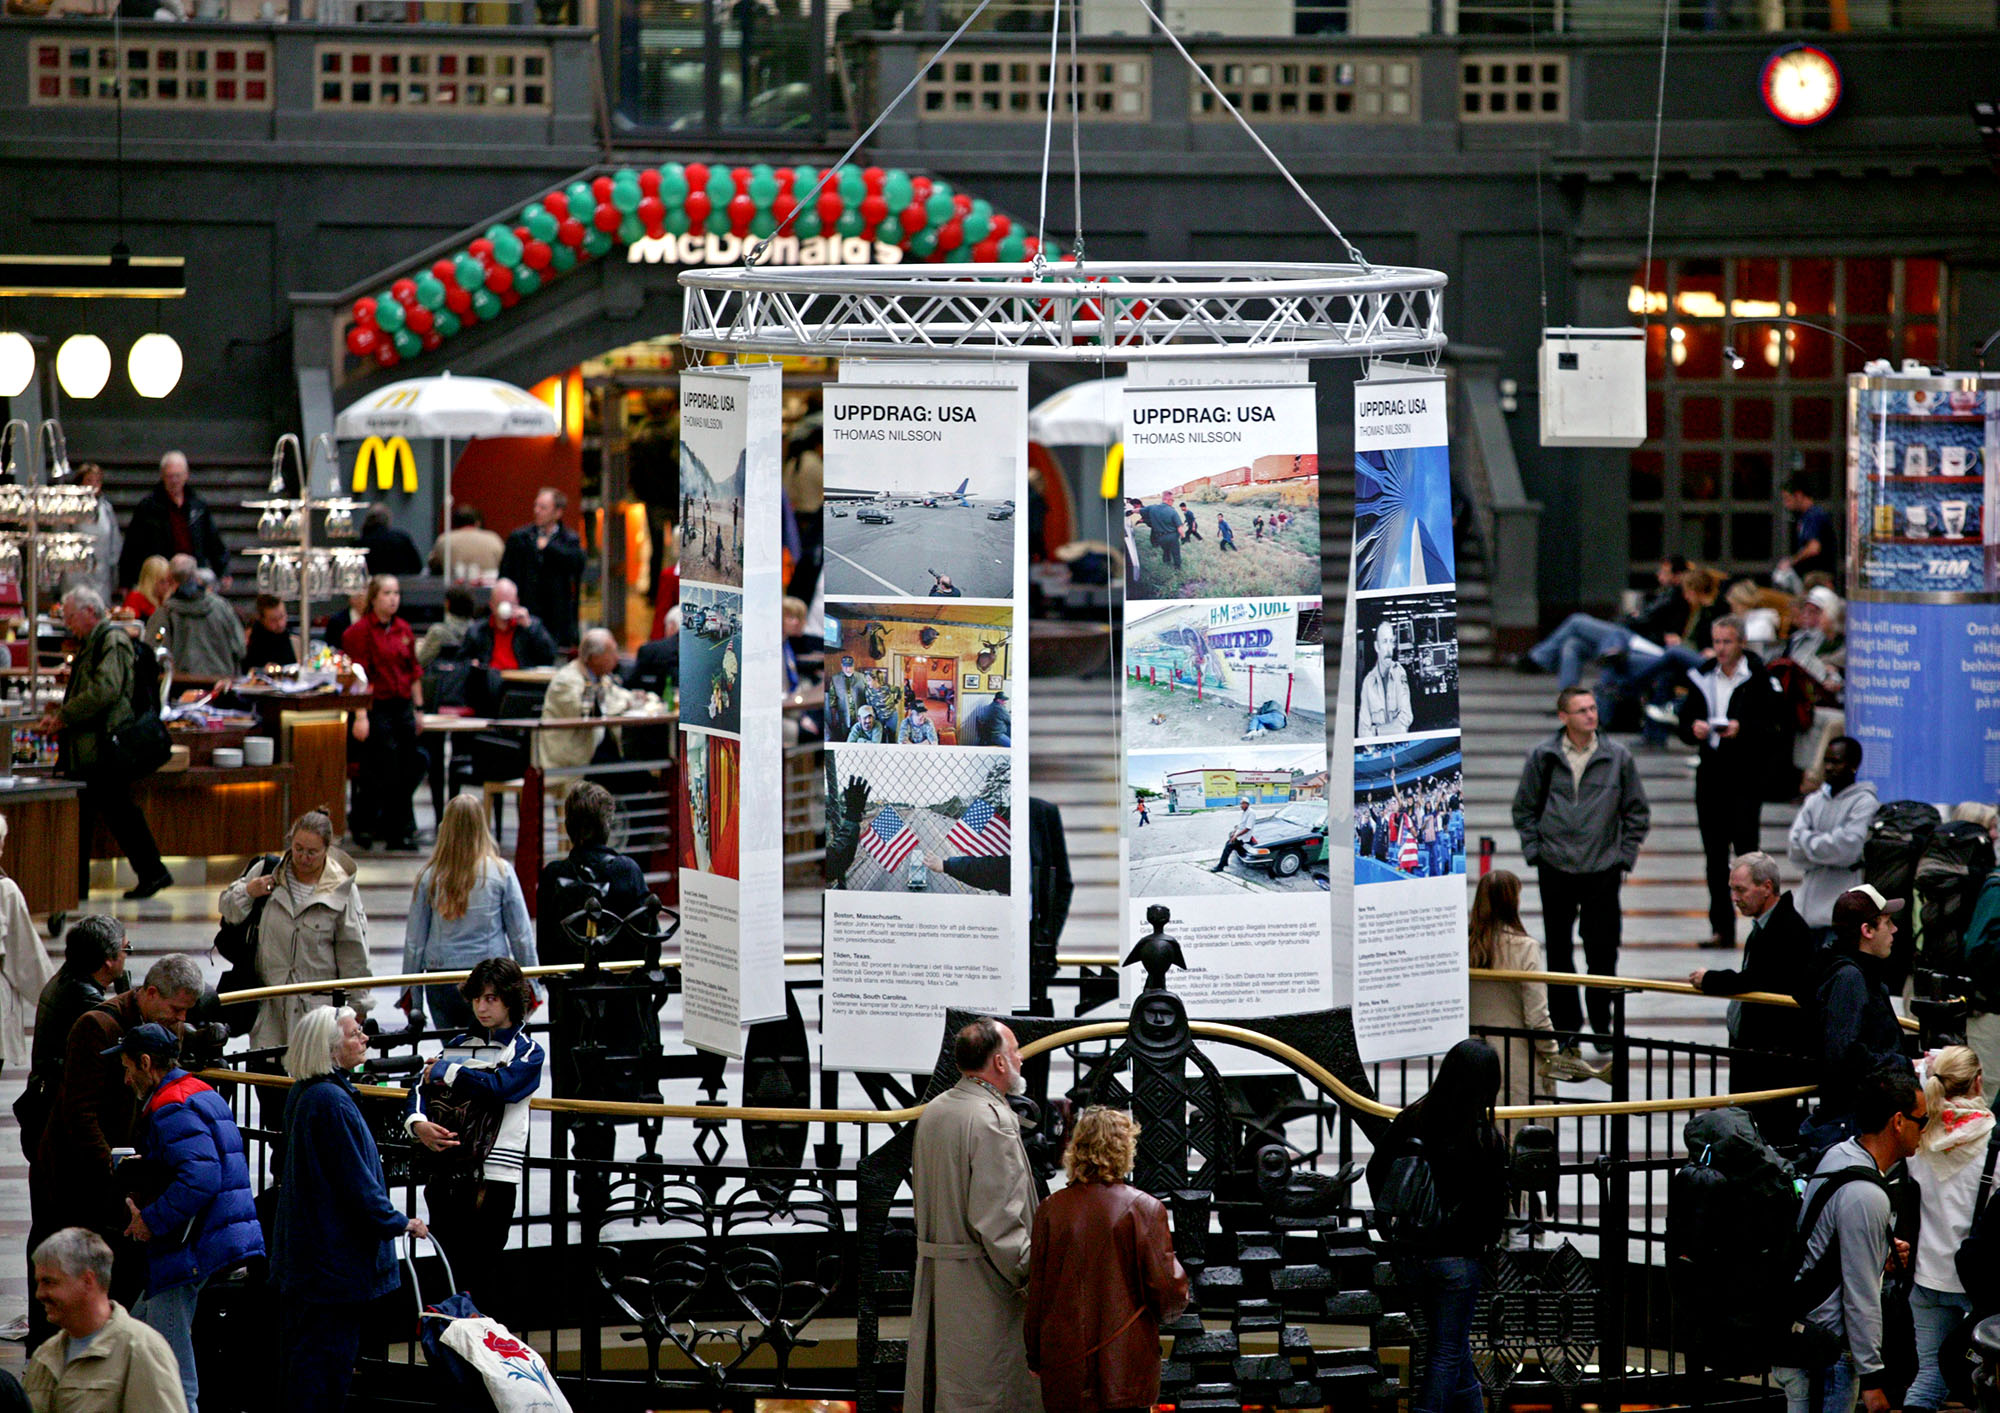 Uppdrag: USA / Assignment: USA - Exhibition at Stockholms Centralstation (The main train station in Stockholm, Sweden). September 2004.